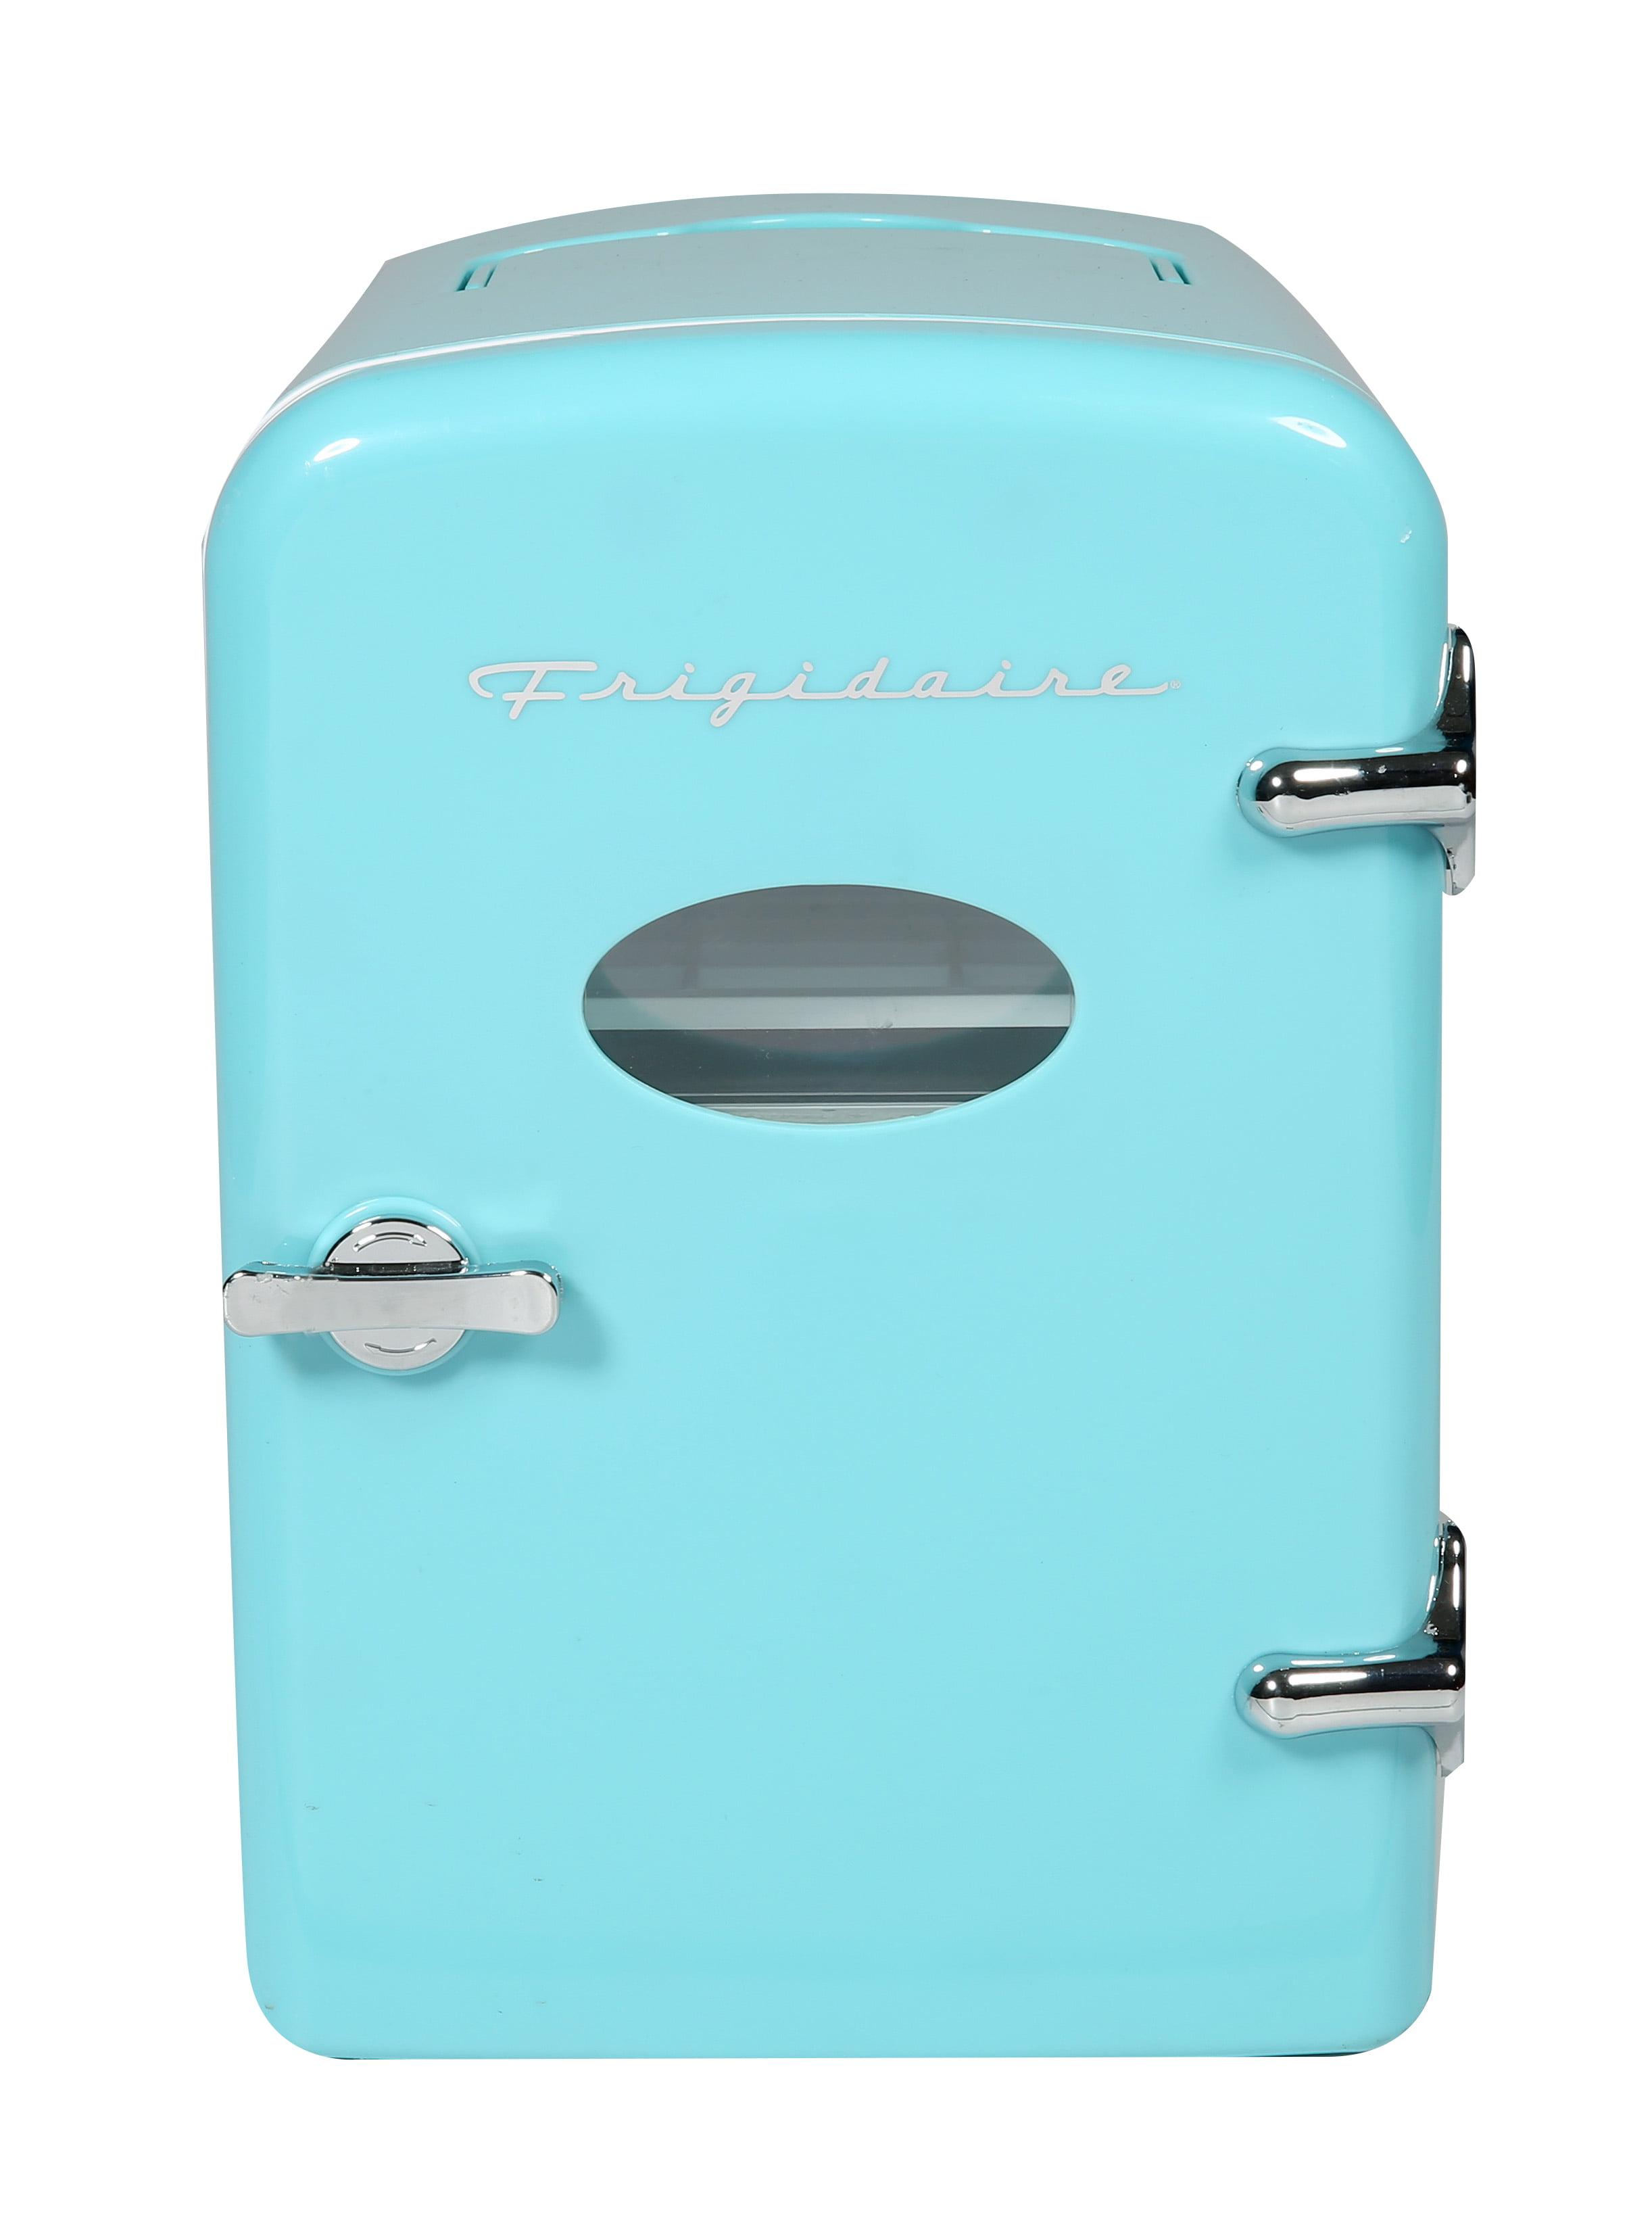 Frigidaire Portable Retro Extra Large 9-Can Mini Fridge EFMIS175, Blue